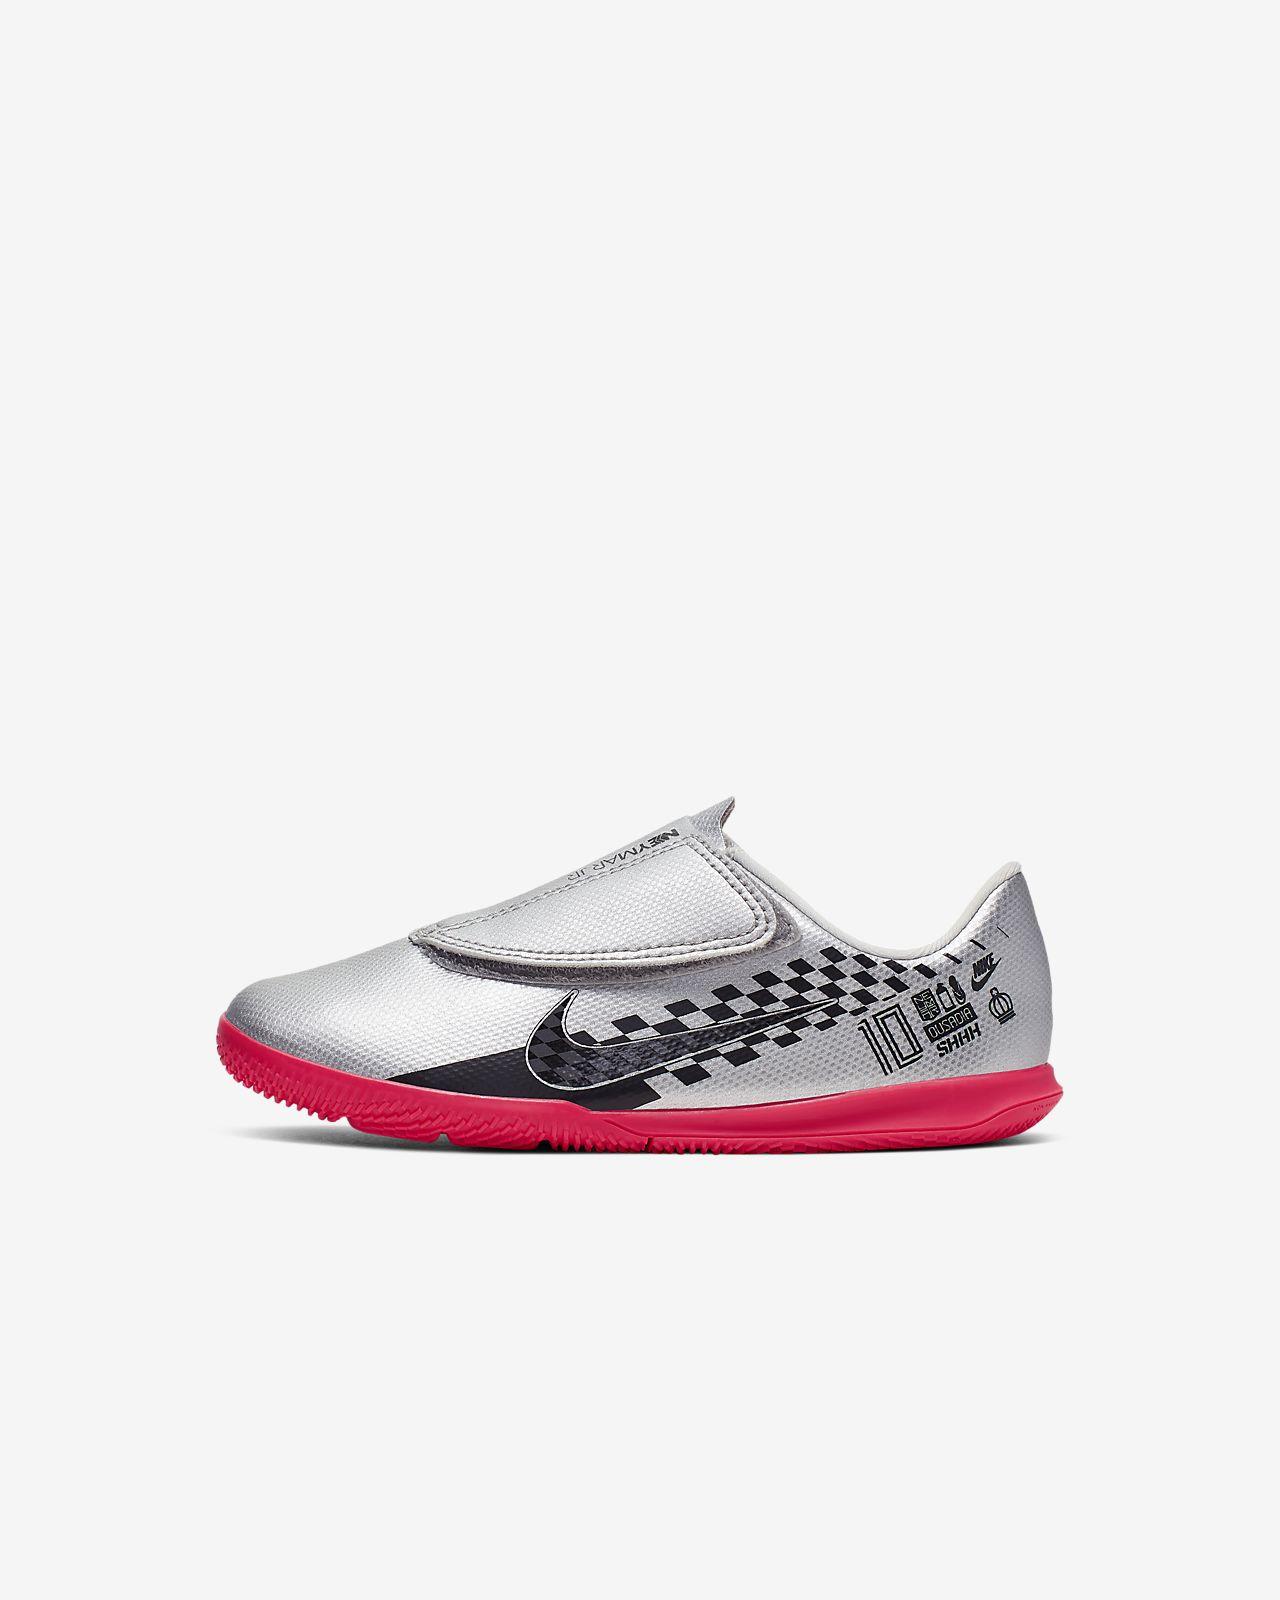 Nike JR Vapor 13 Club NJR IC PS (V)幼童室内/球场足球童鞋